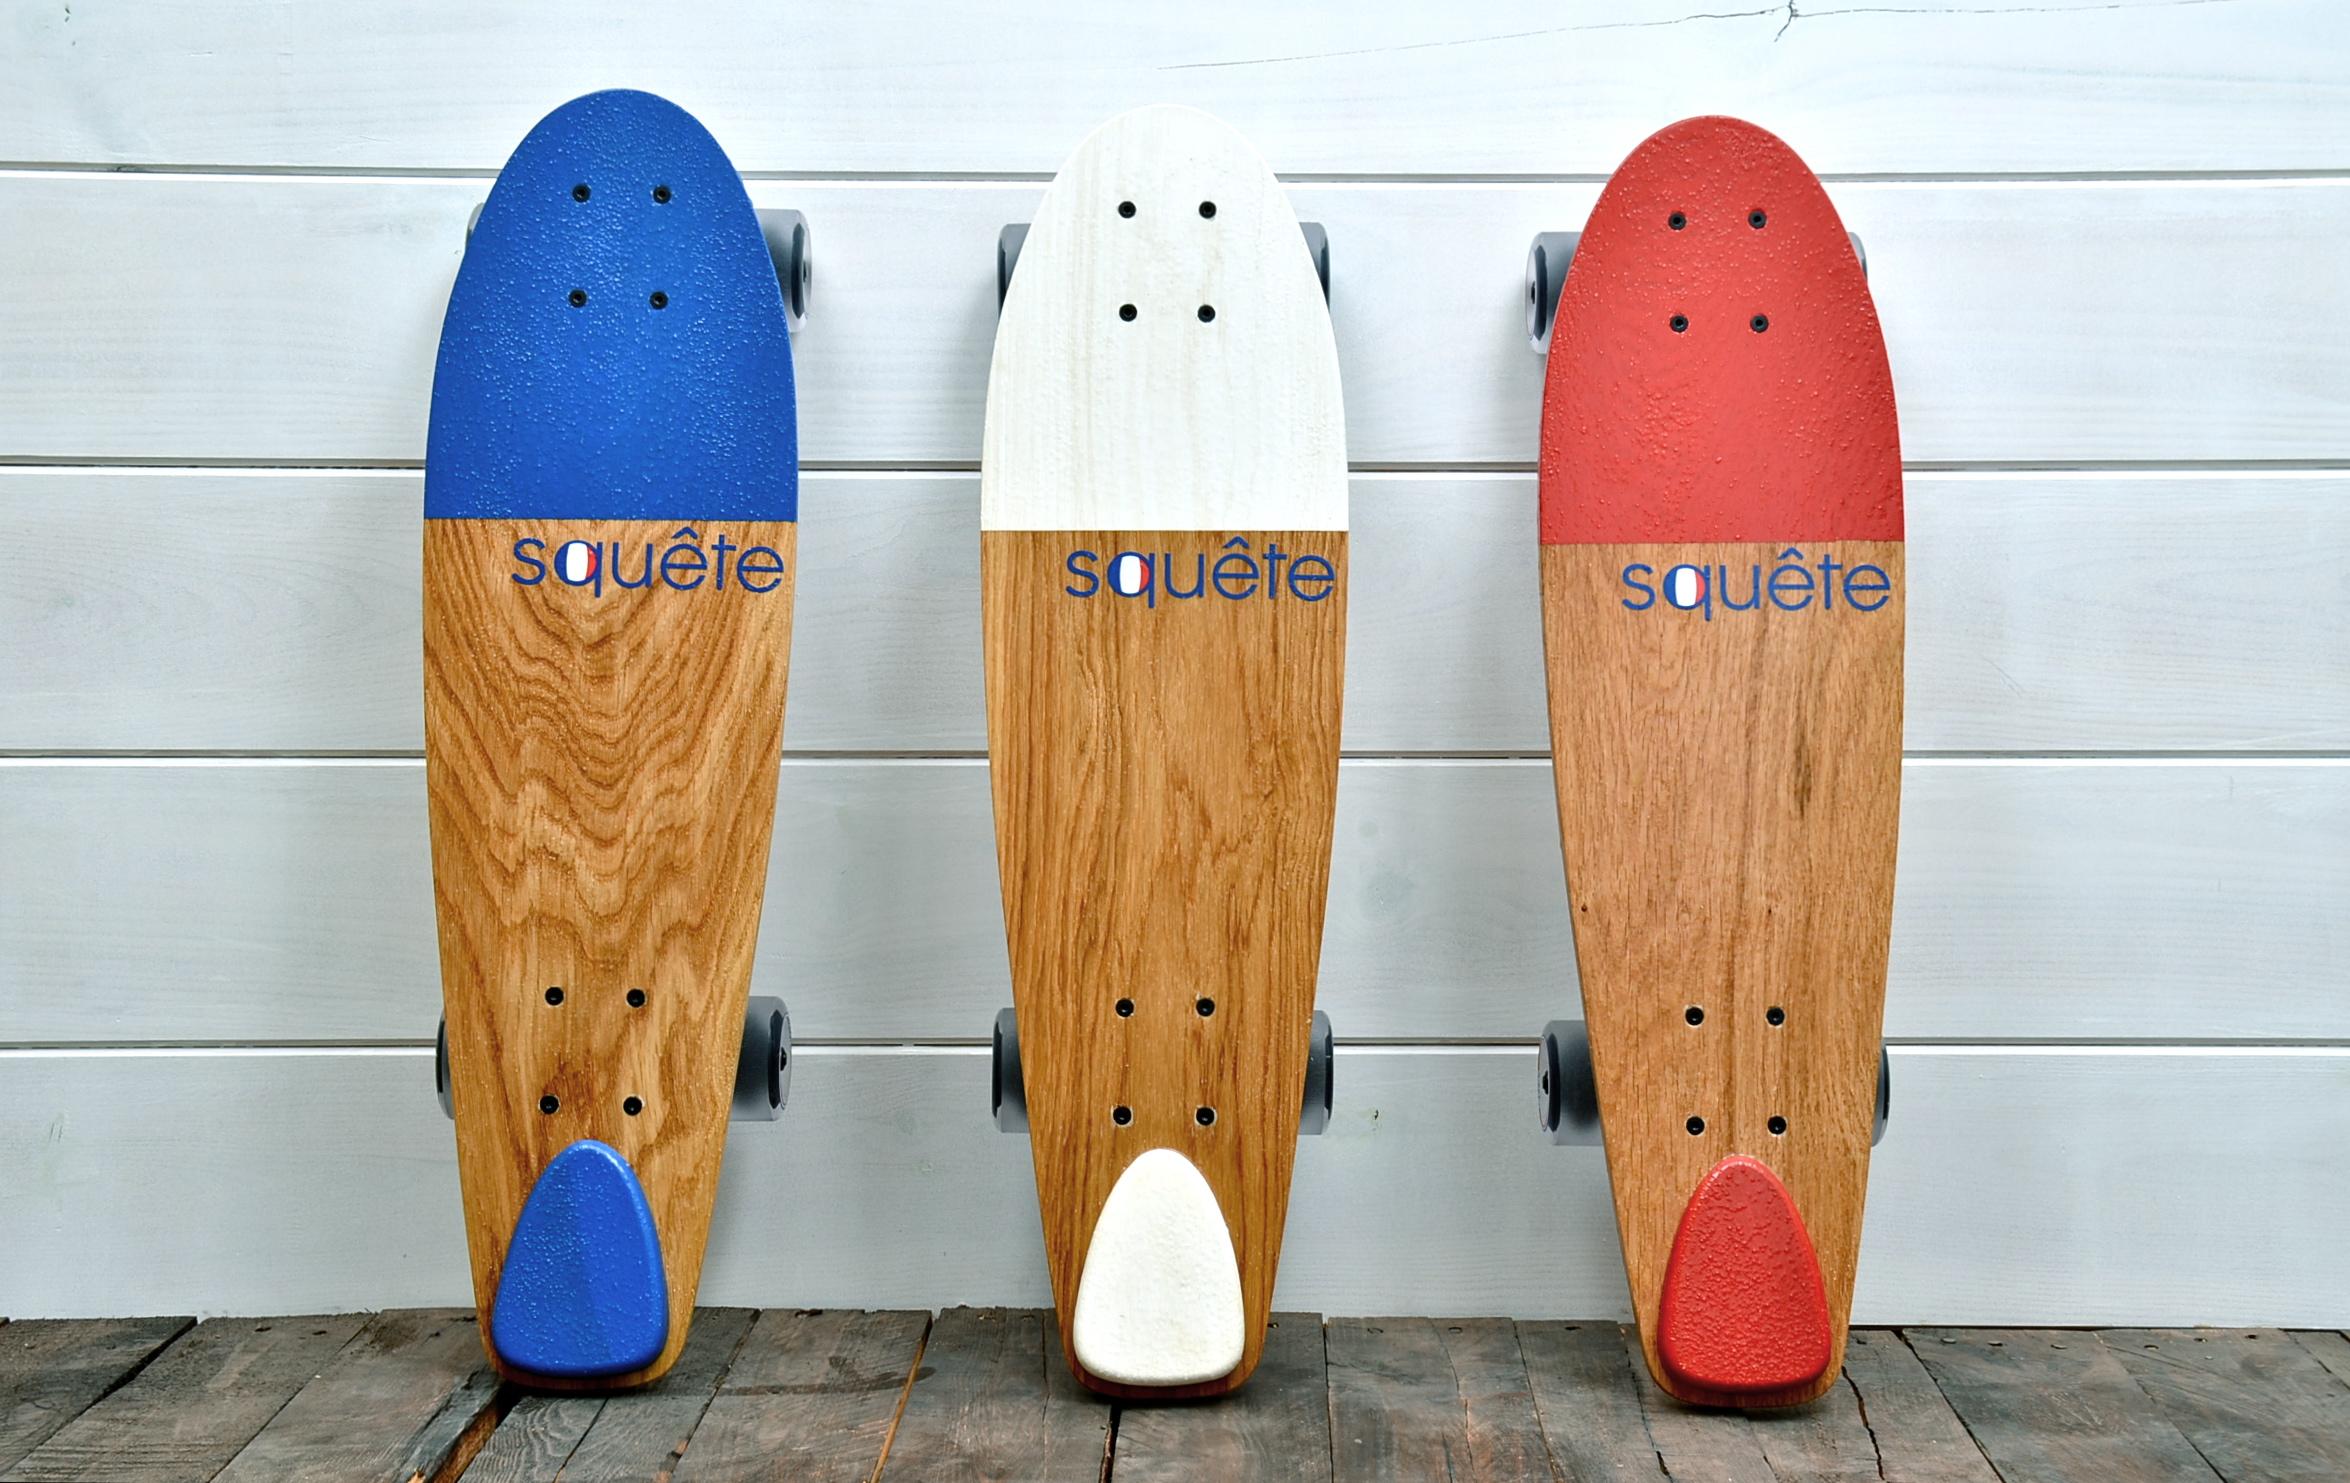 Squête skateboard